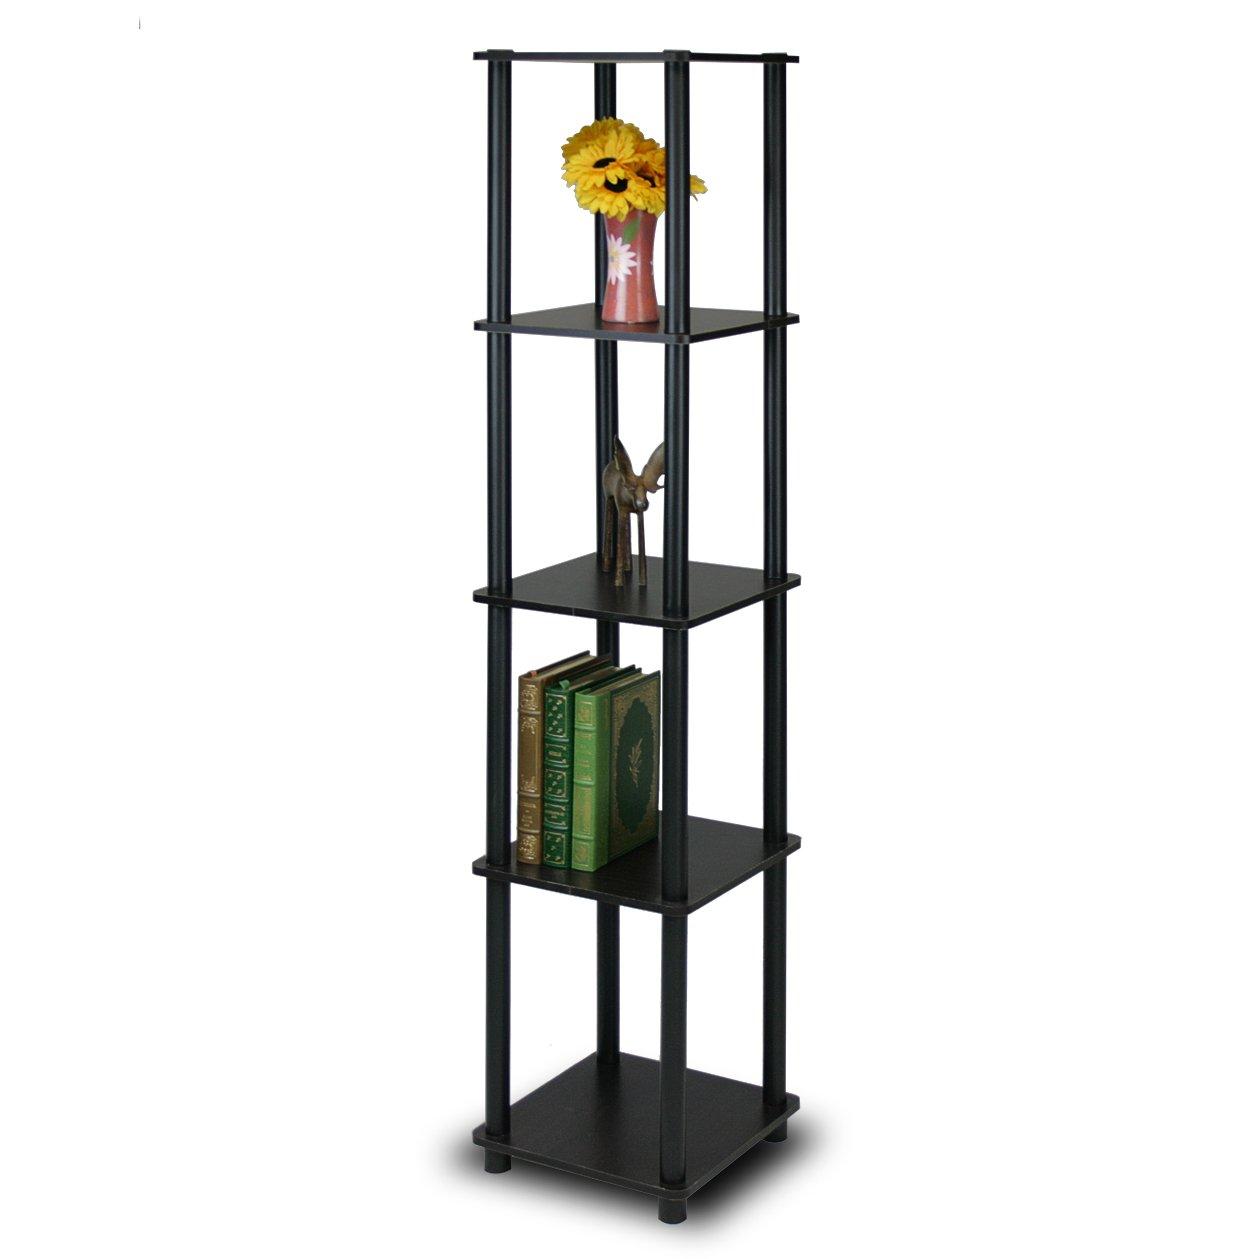 Furinno 99132EX/BK Turn-N-Tube 5-Tier Corner Square Rack Display Shelf, Espresso/Black by Furinno